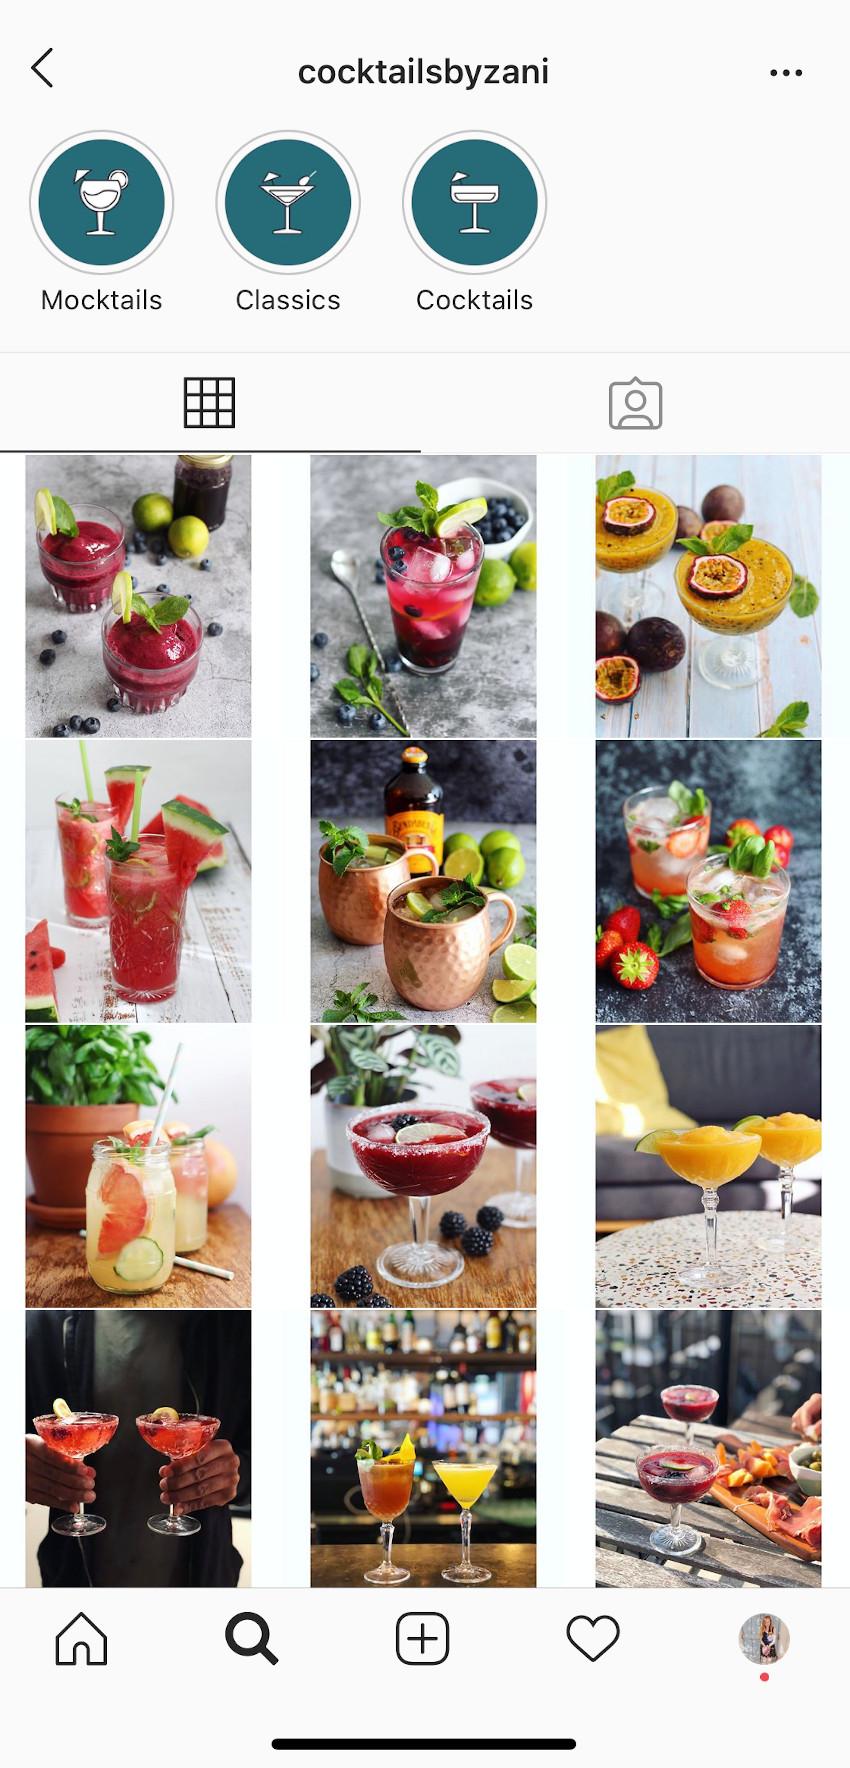 Cocktails by Zani: Instagram cocktailaccount